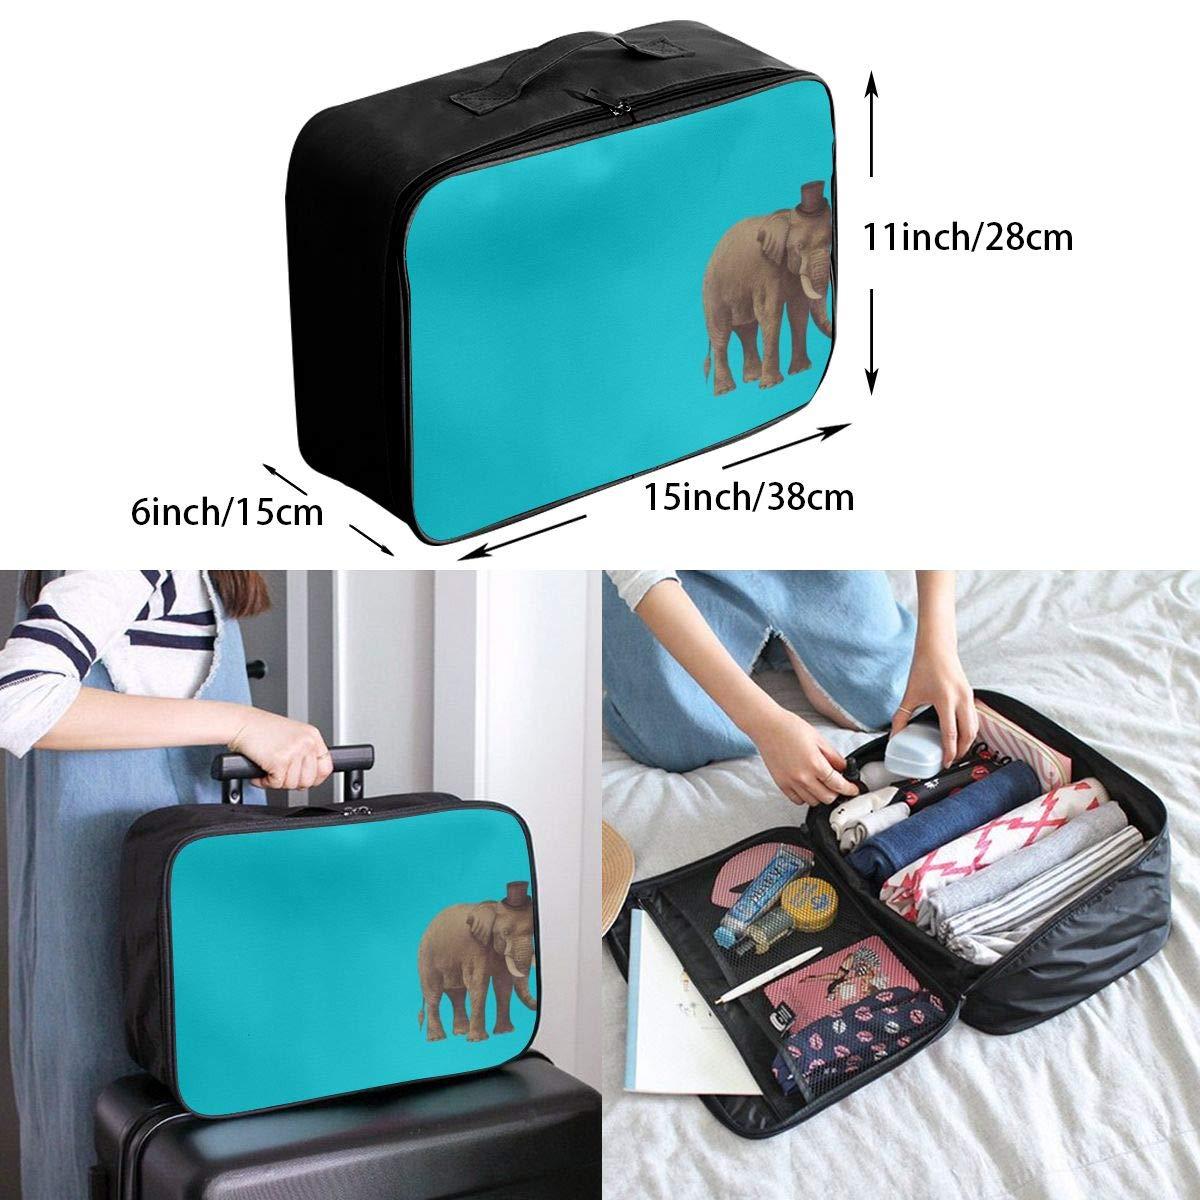 Elephant Travel Luggage Storage Bag Duffel Bag Handle Makeup Bag Fashion Lightweight Large Capacity Portable Luggage Bag